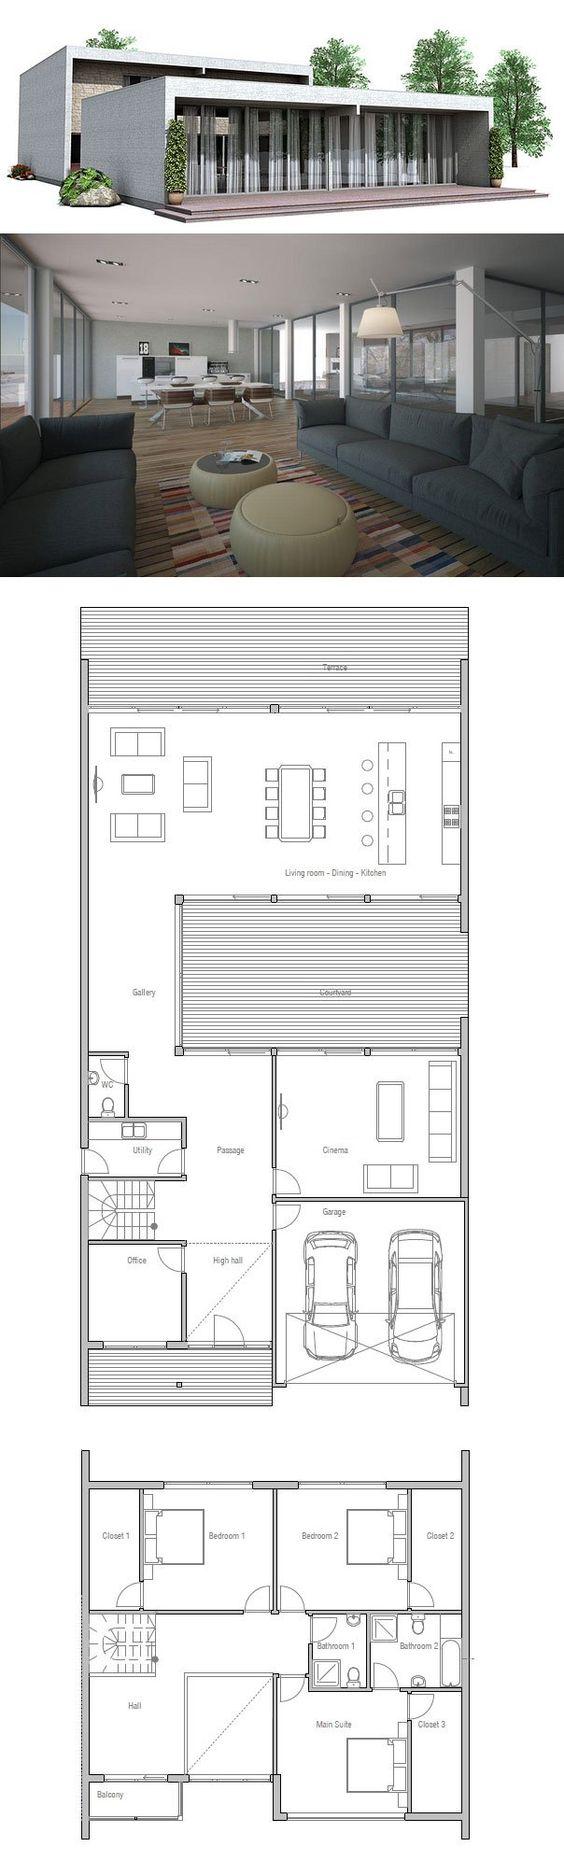 spektakul re h user conhouse. Black Bedroom Furniture Sets. Home Design Ideas